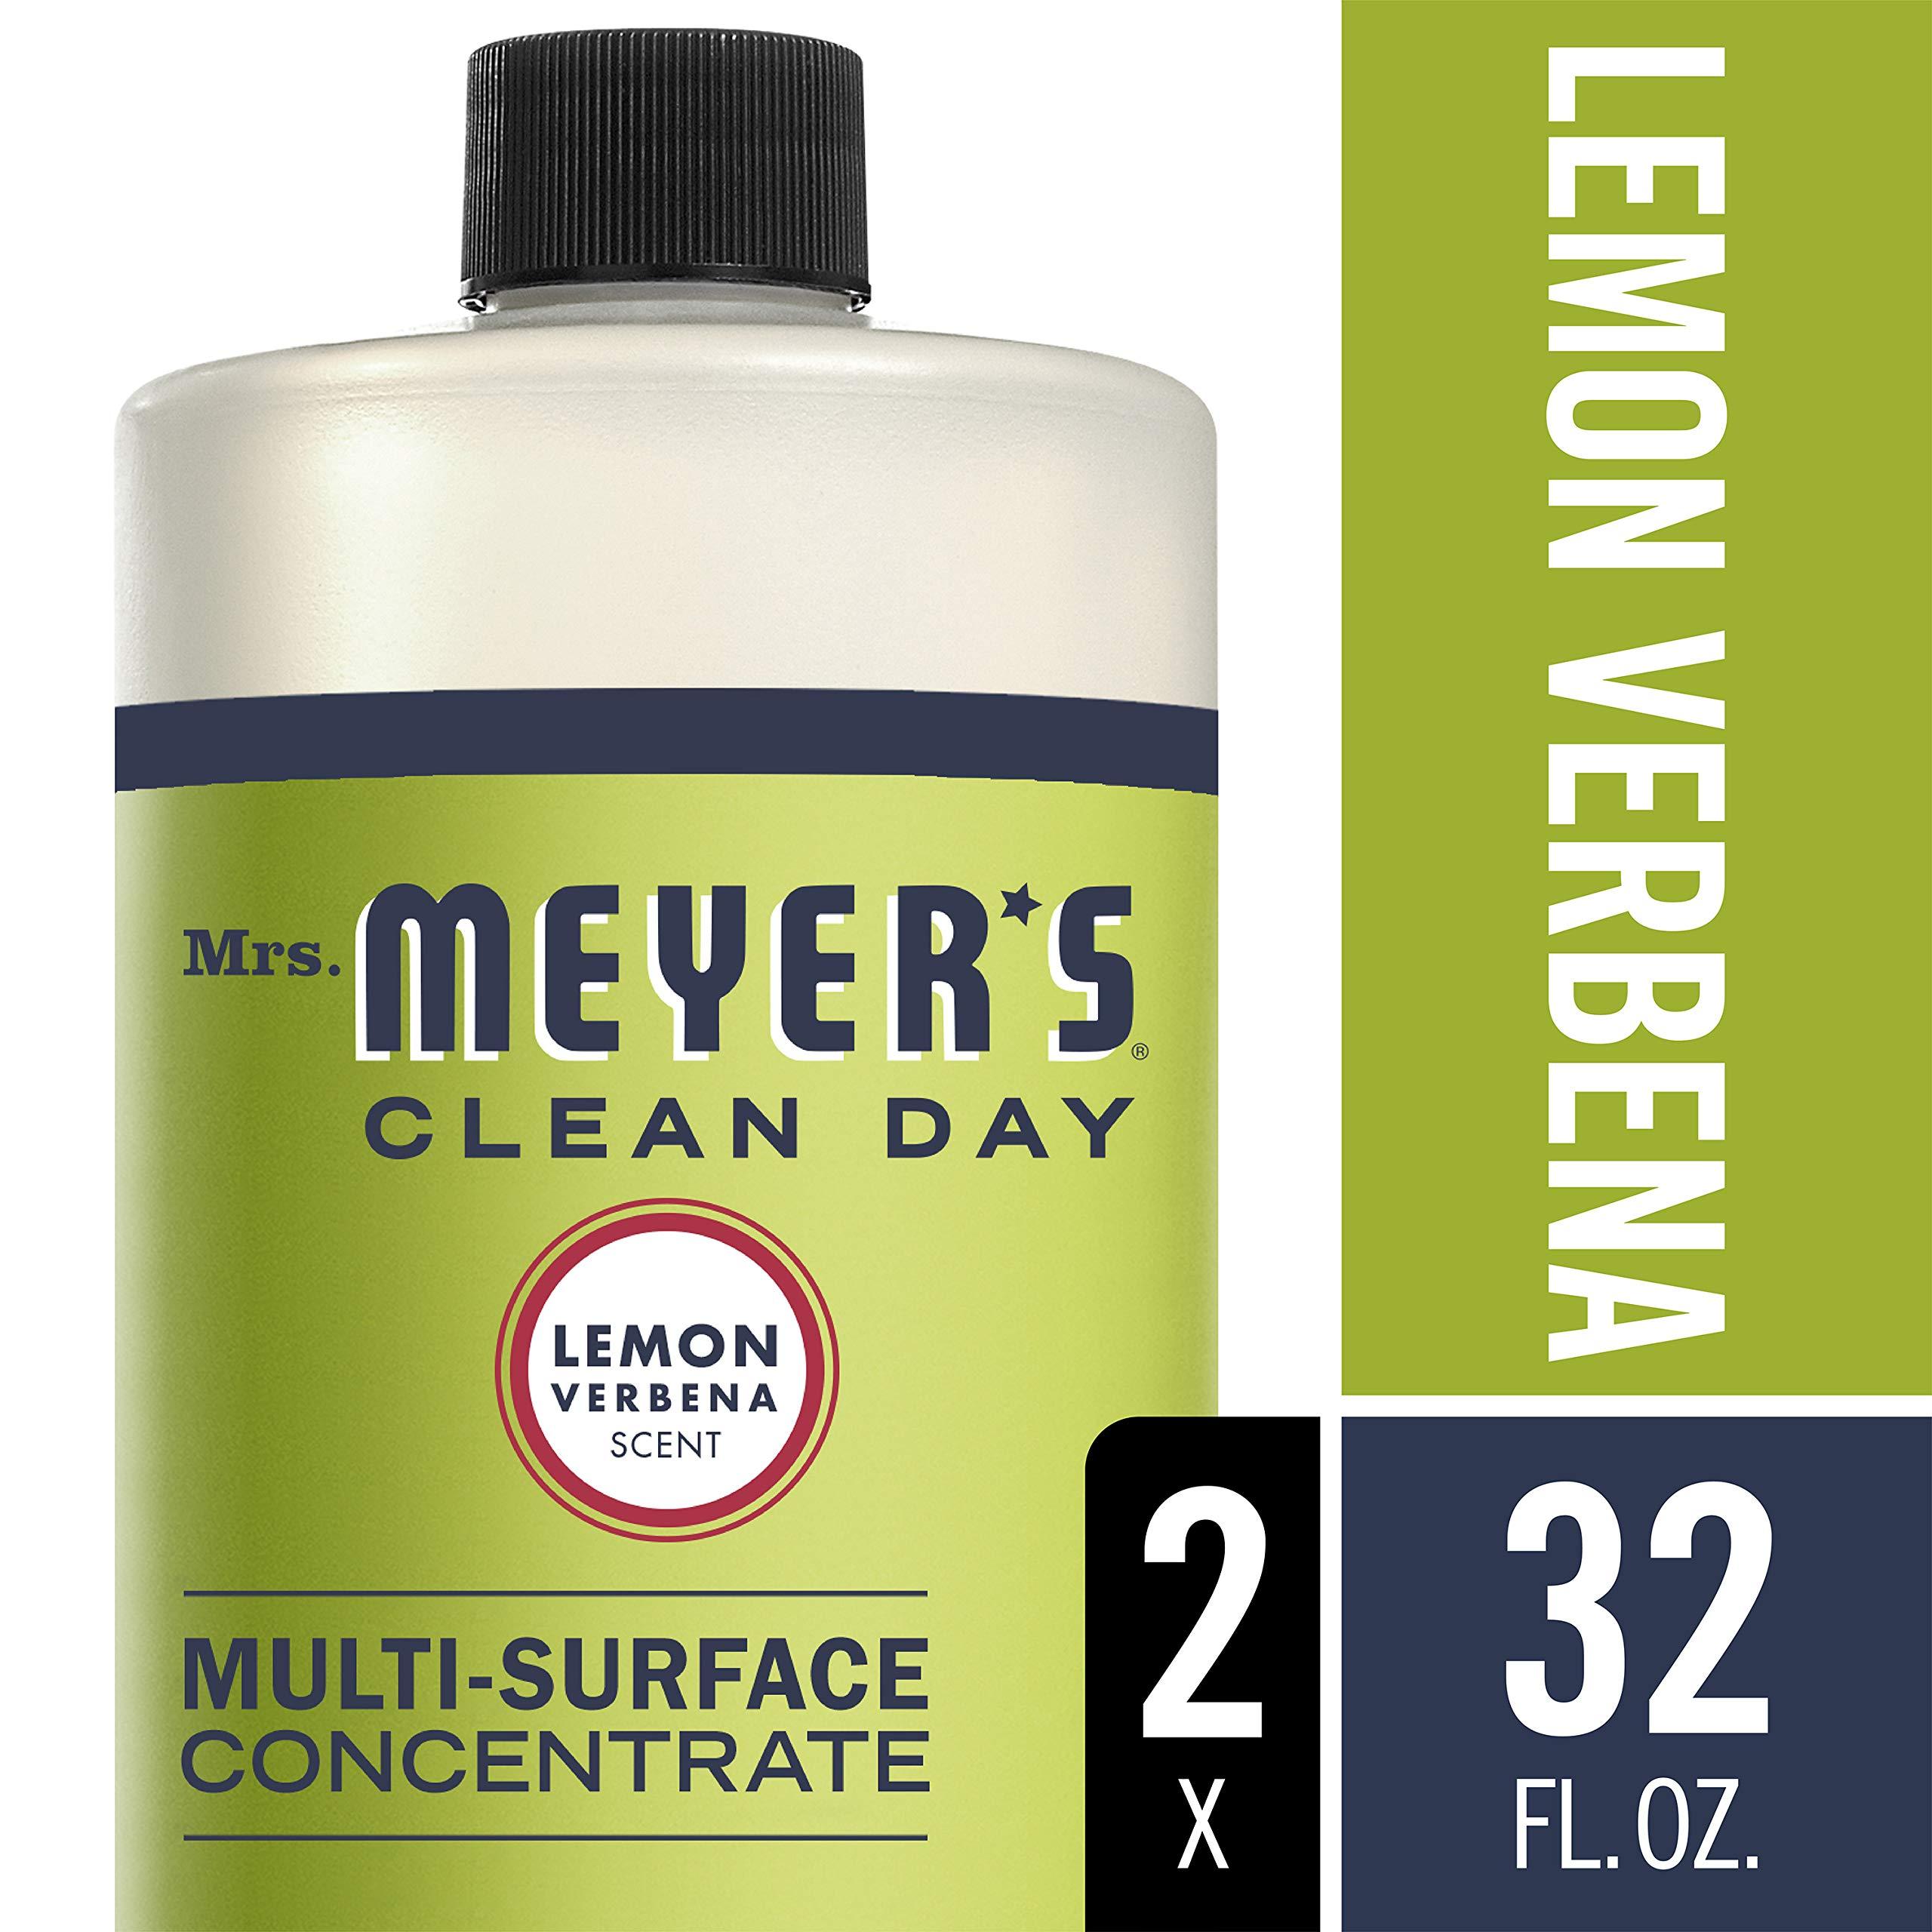 Mrs. Meyer's Clean Day Multi-Surface Concentrate, Lemon Verbena, 32 fl oz, 2 ct